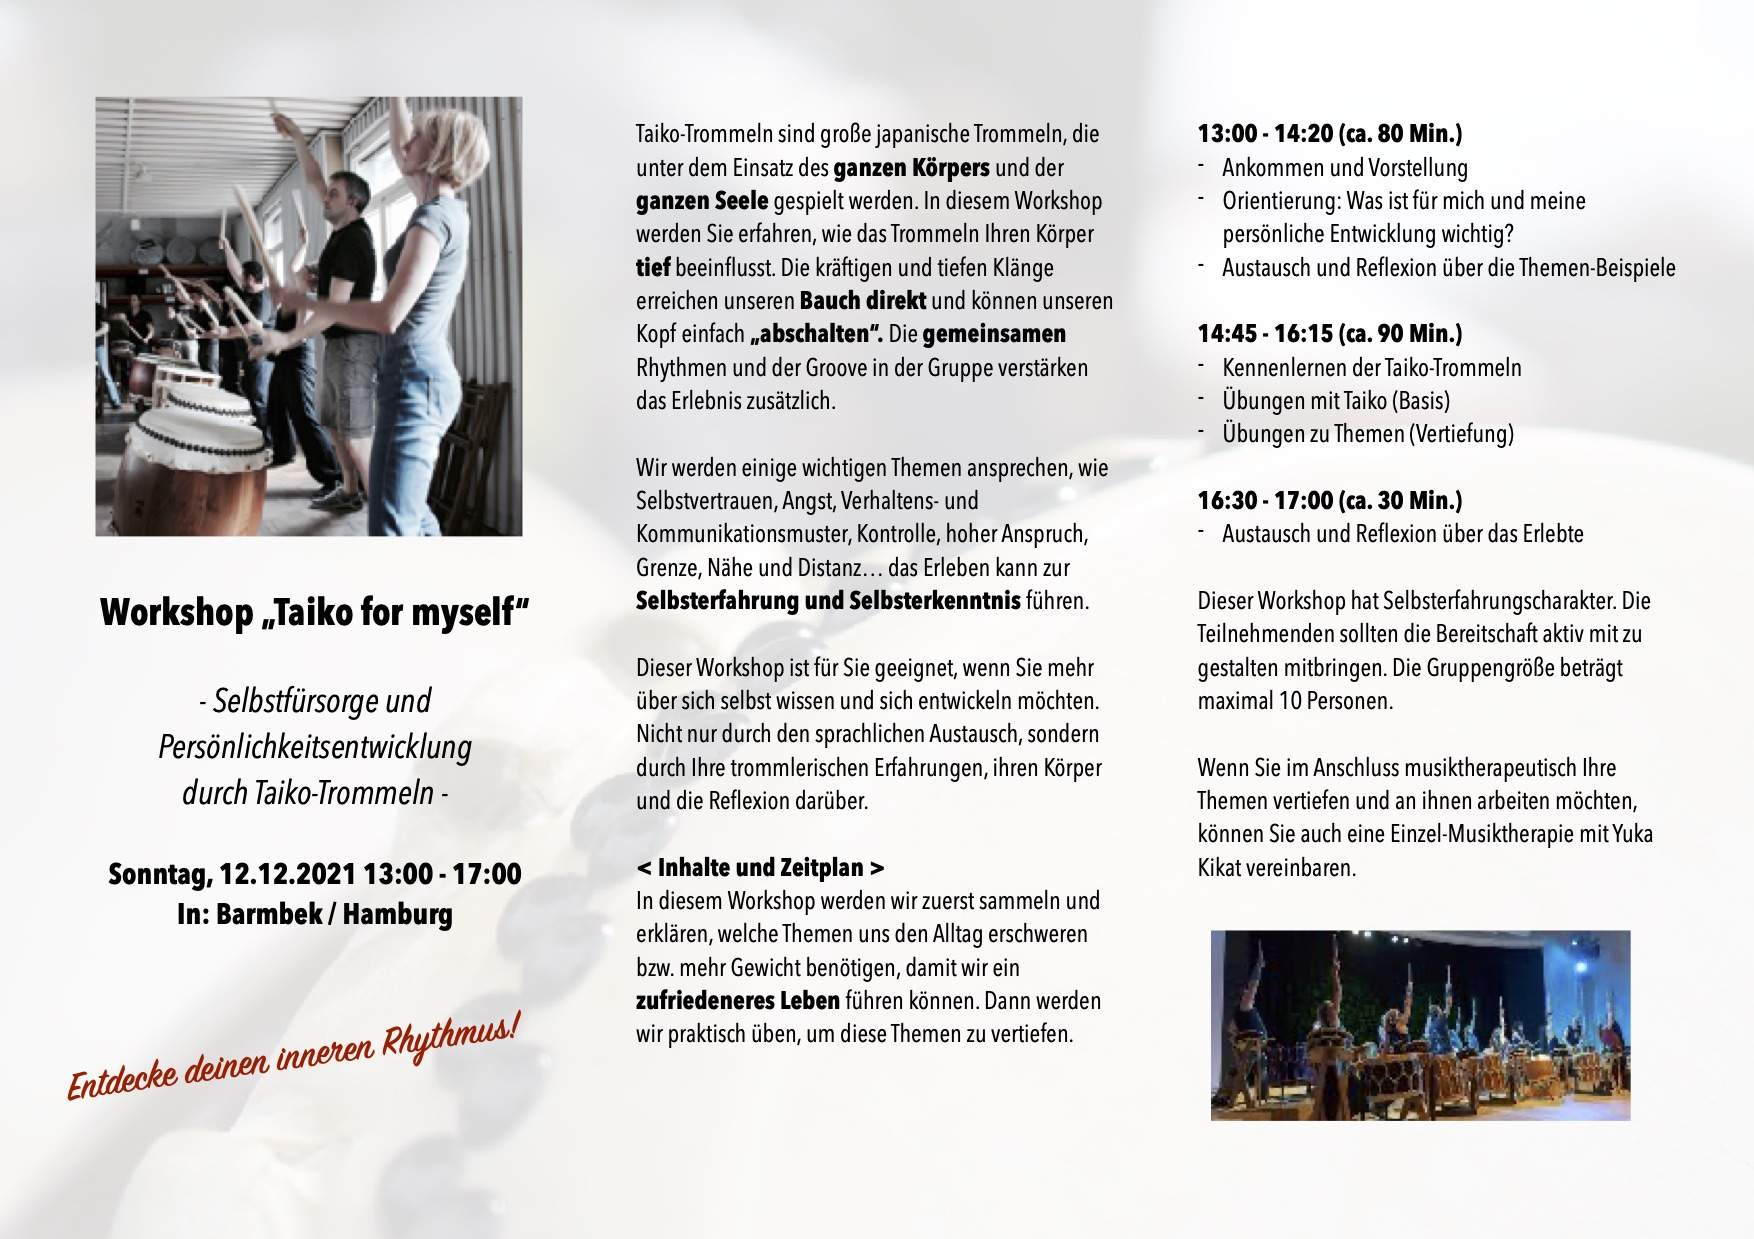 "Workshop ""Taiko for myself"" 12.12.2021"